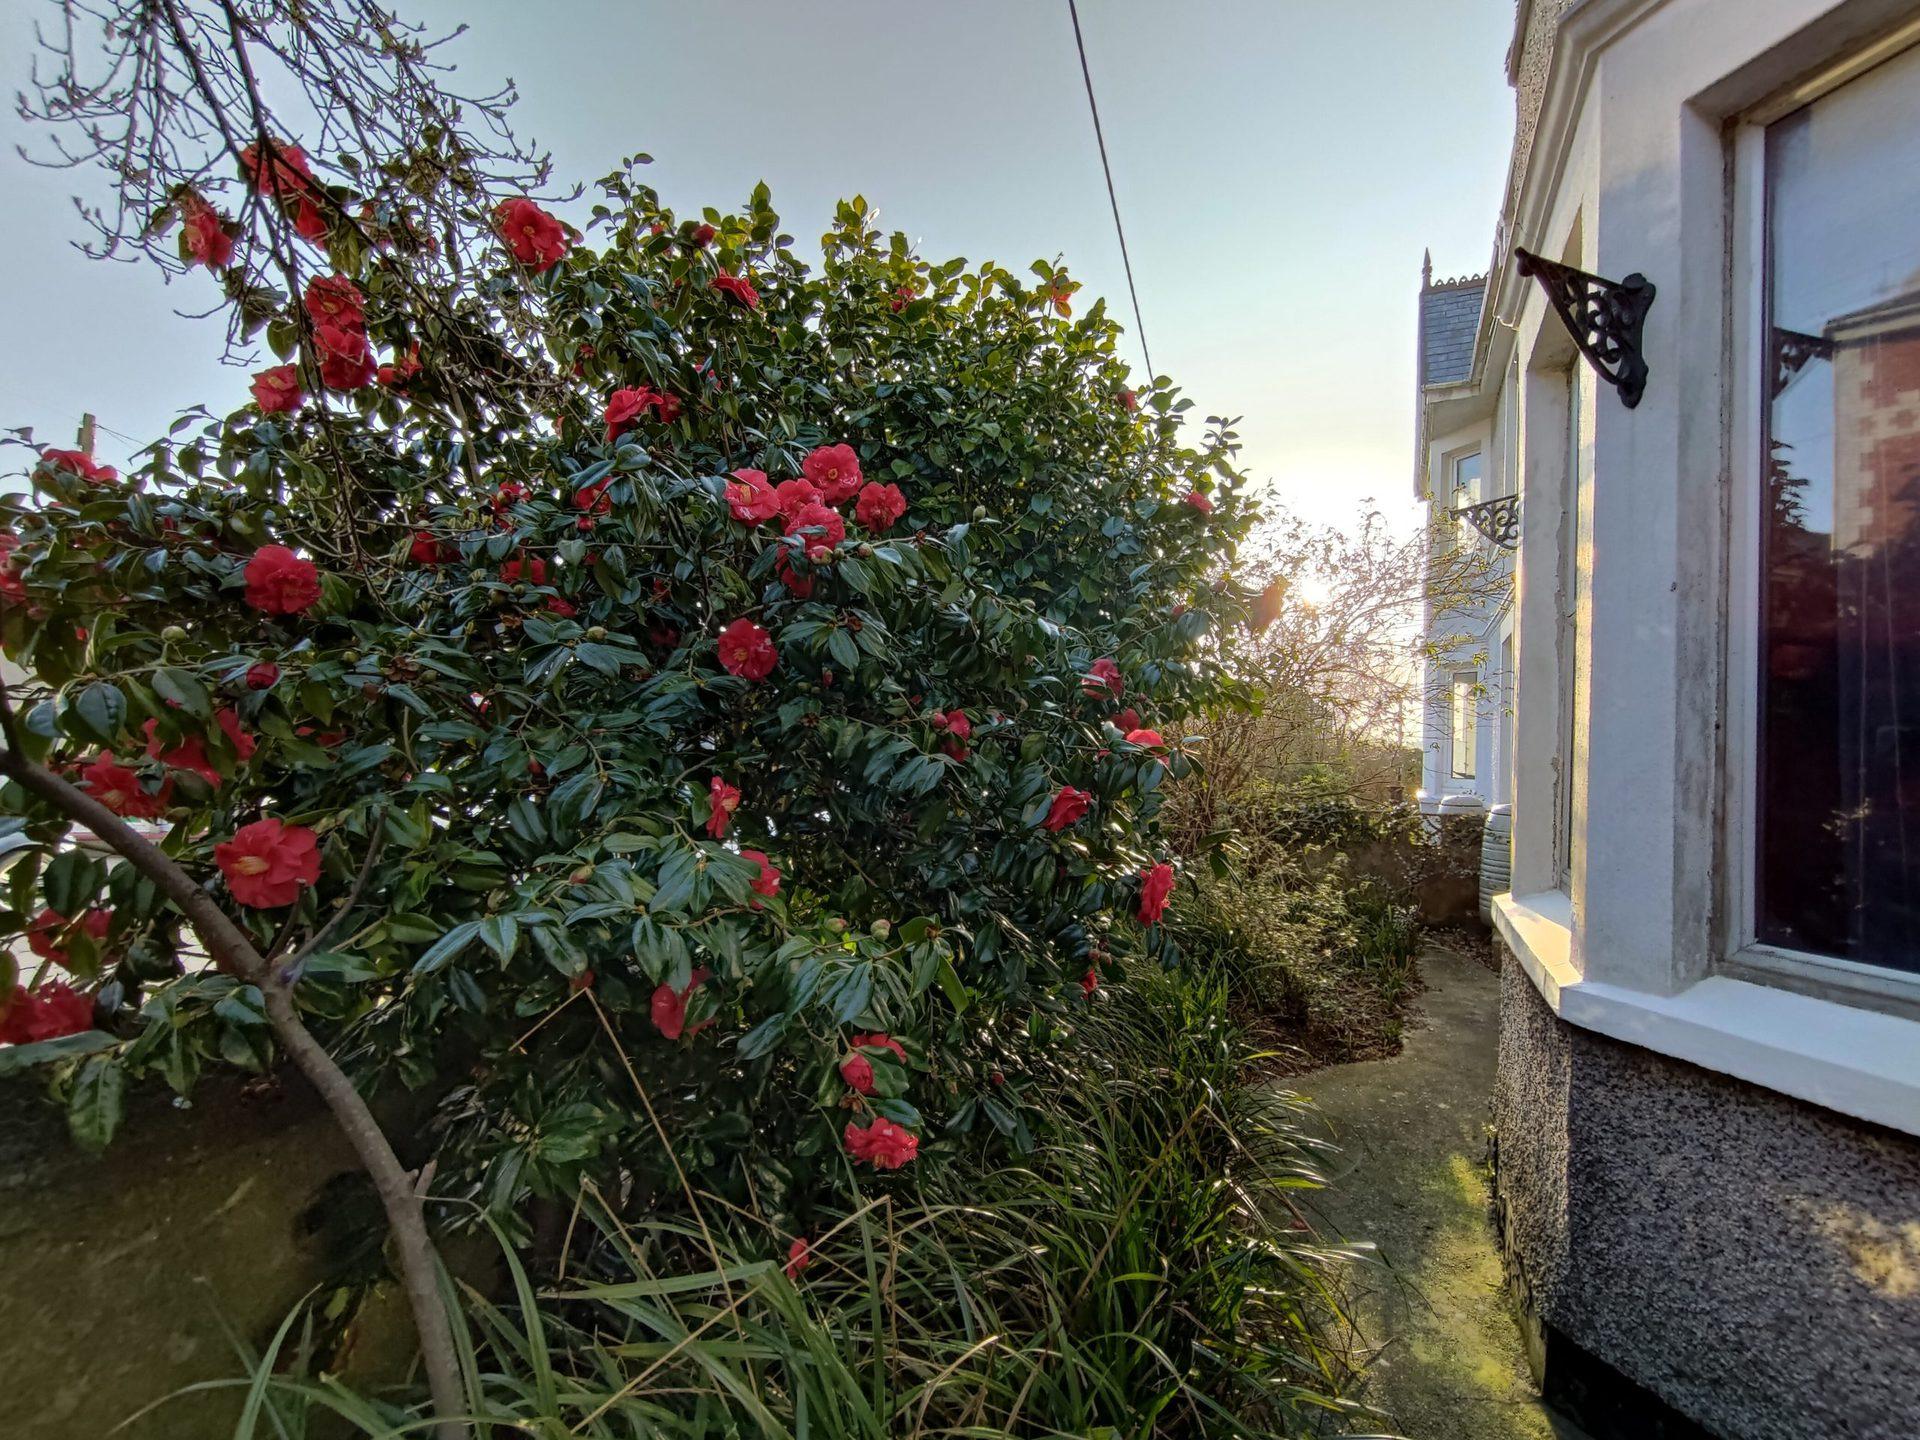 ROG Phone 5 ultra wide camera sample of a flowery bush